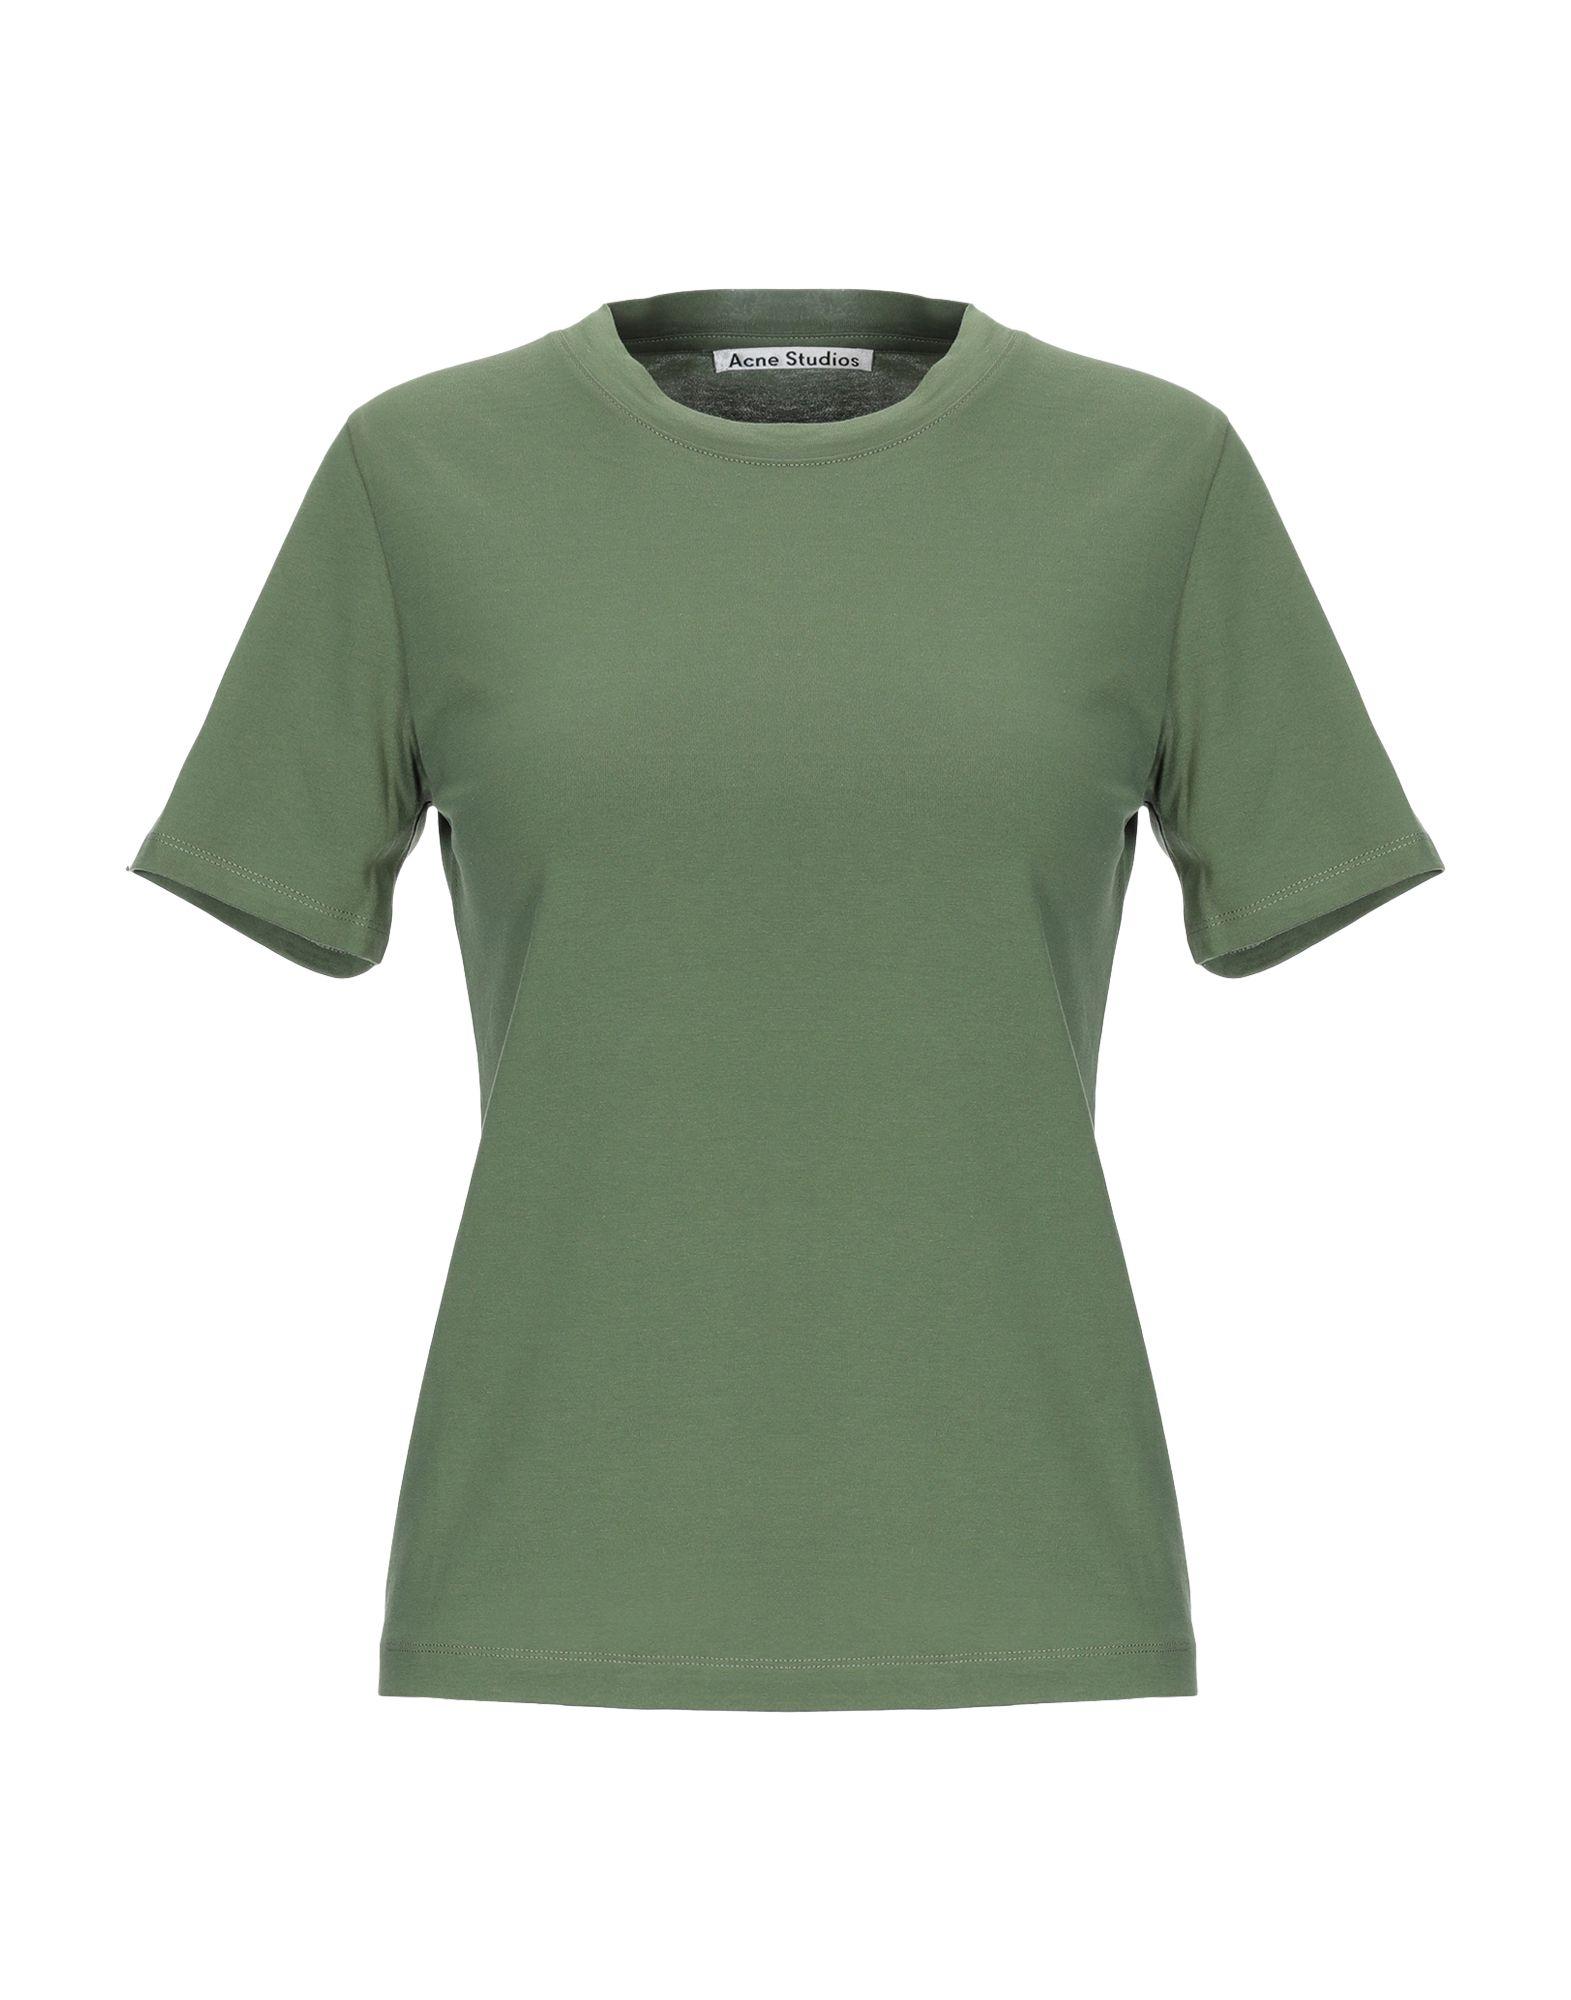 ACNE STUDIOS Футболка acne studios зеленая хлопковая футболка nash